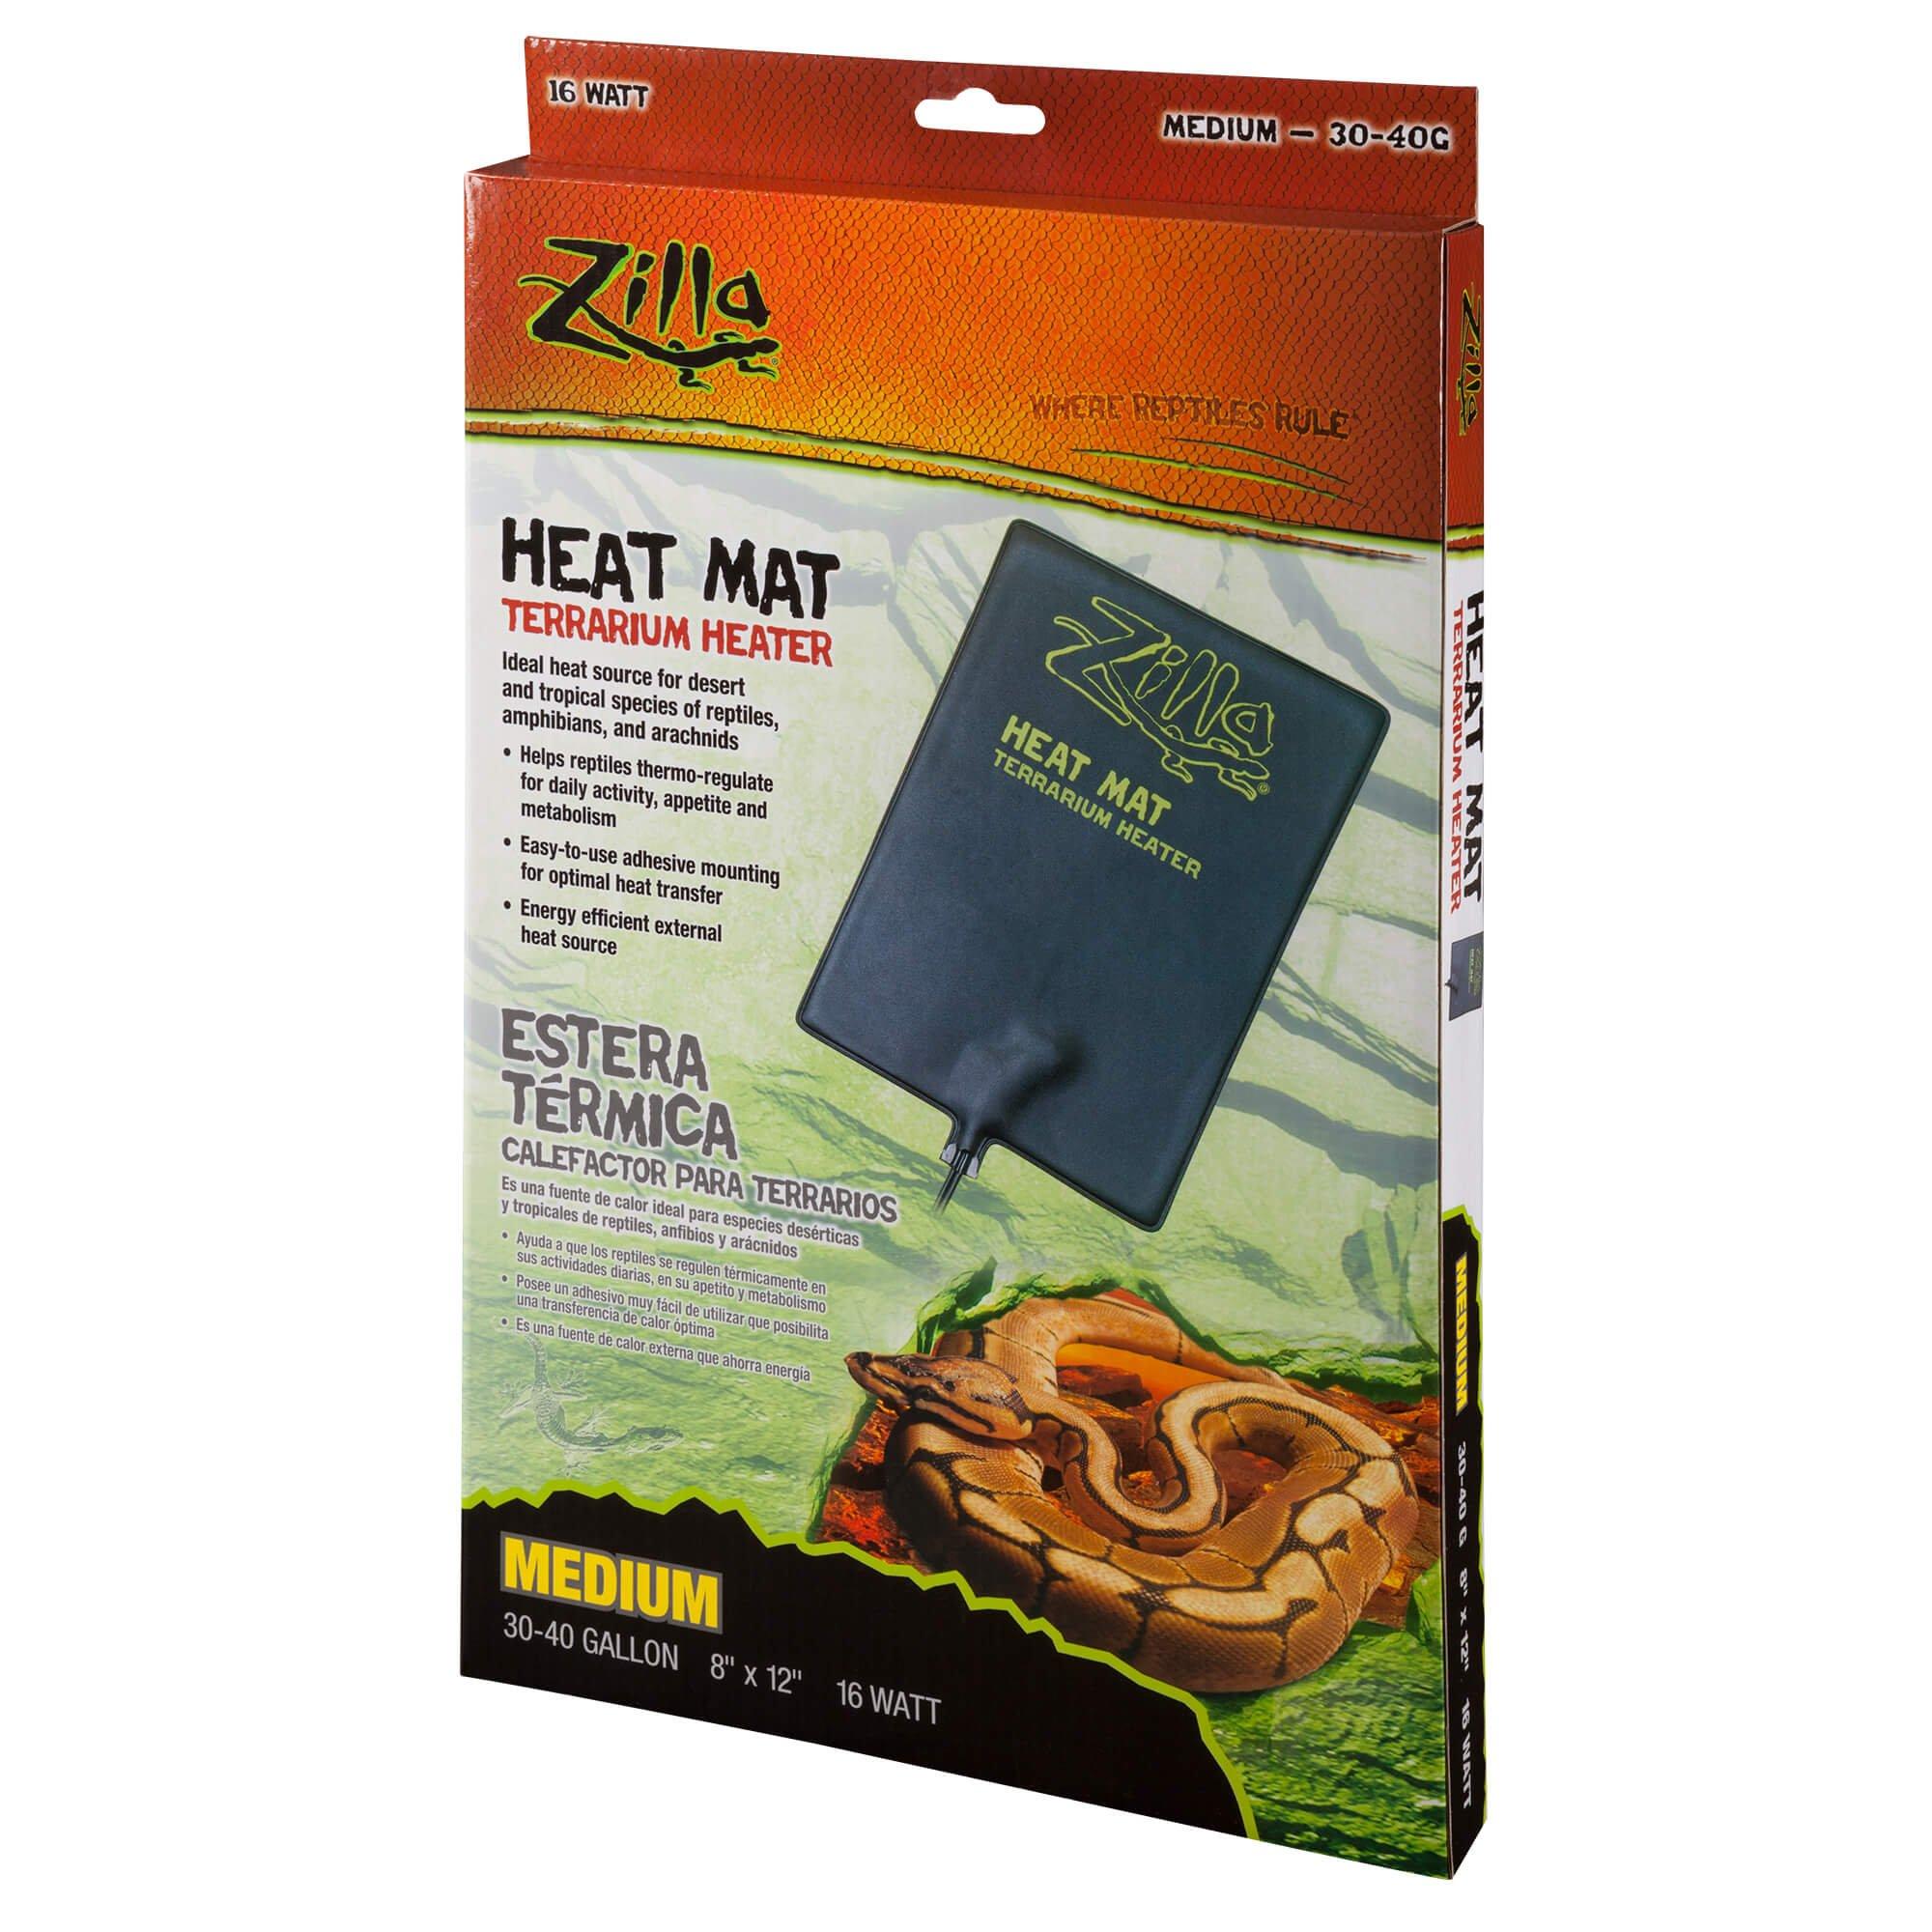 Zilla Under Tank Reptile Heaters, Medium